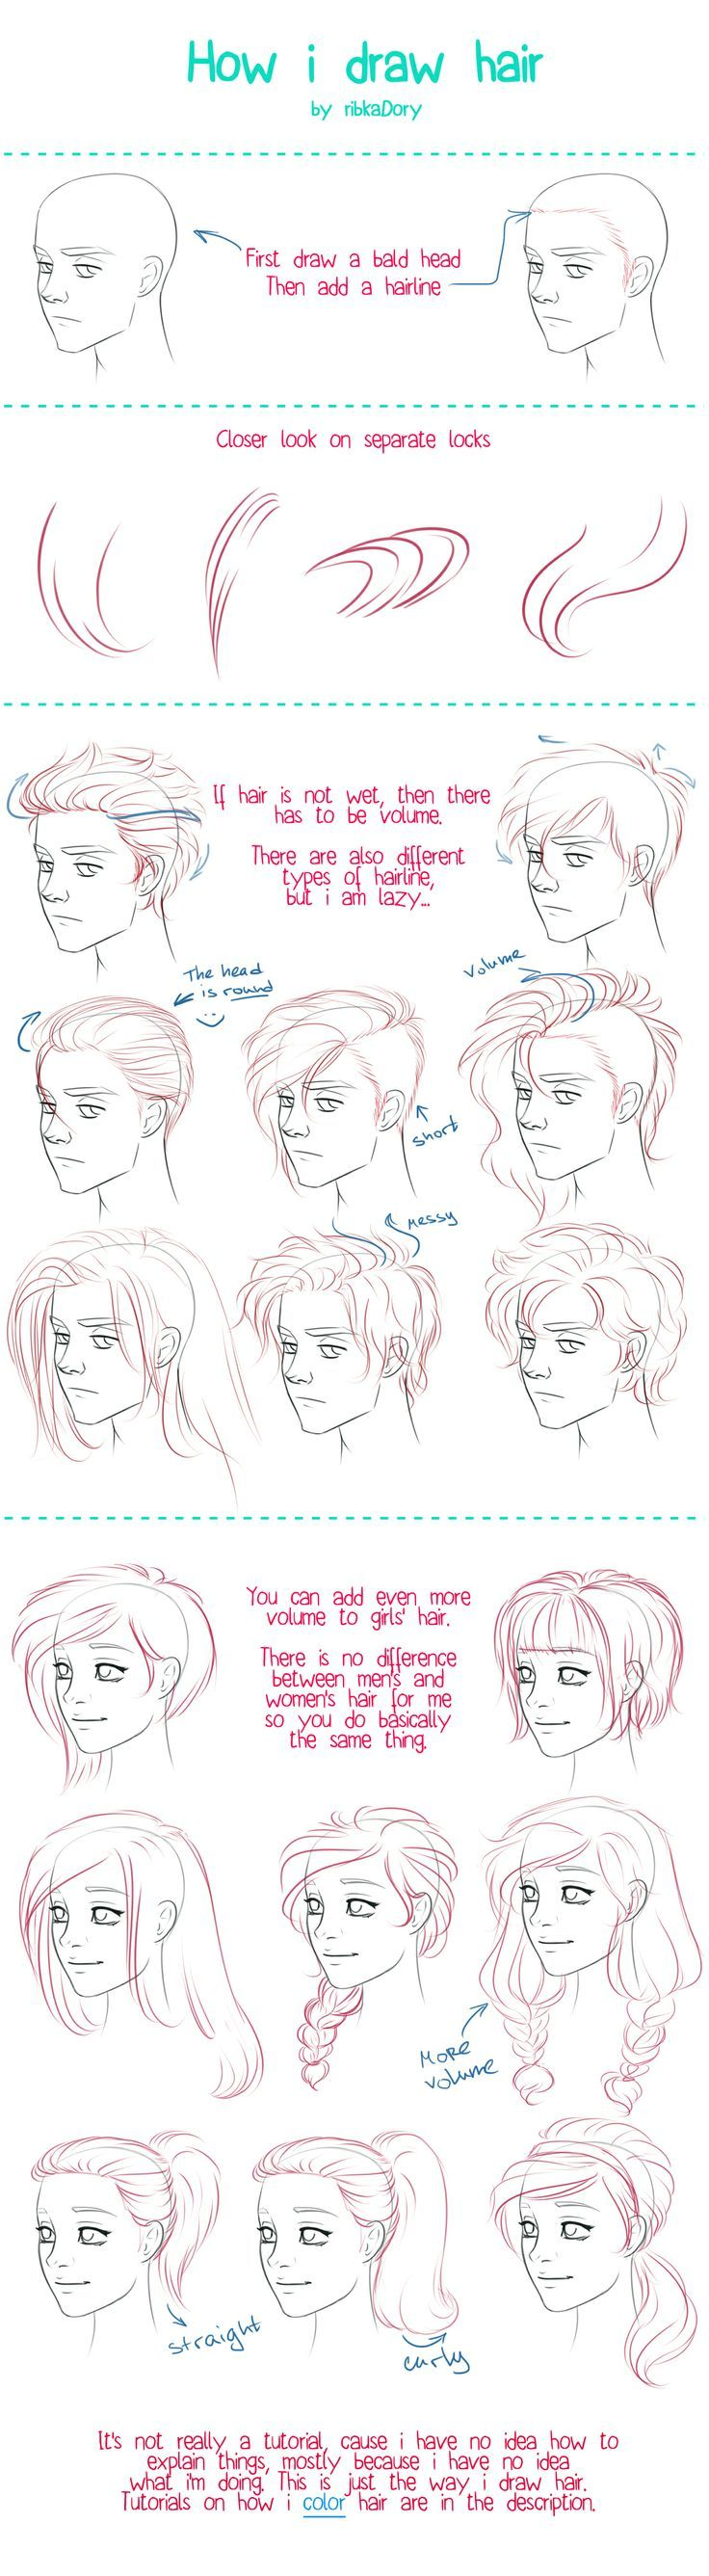 How I Draw Hair by =ribkaDory on deviantART (scheduled via http://www.tailwindapp.com?utm_source=pinterest&utm_medium=twpin&utm_content=post1340065&utm_campaign=scheduler_attribution)